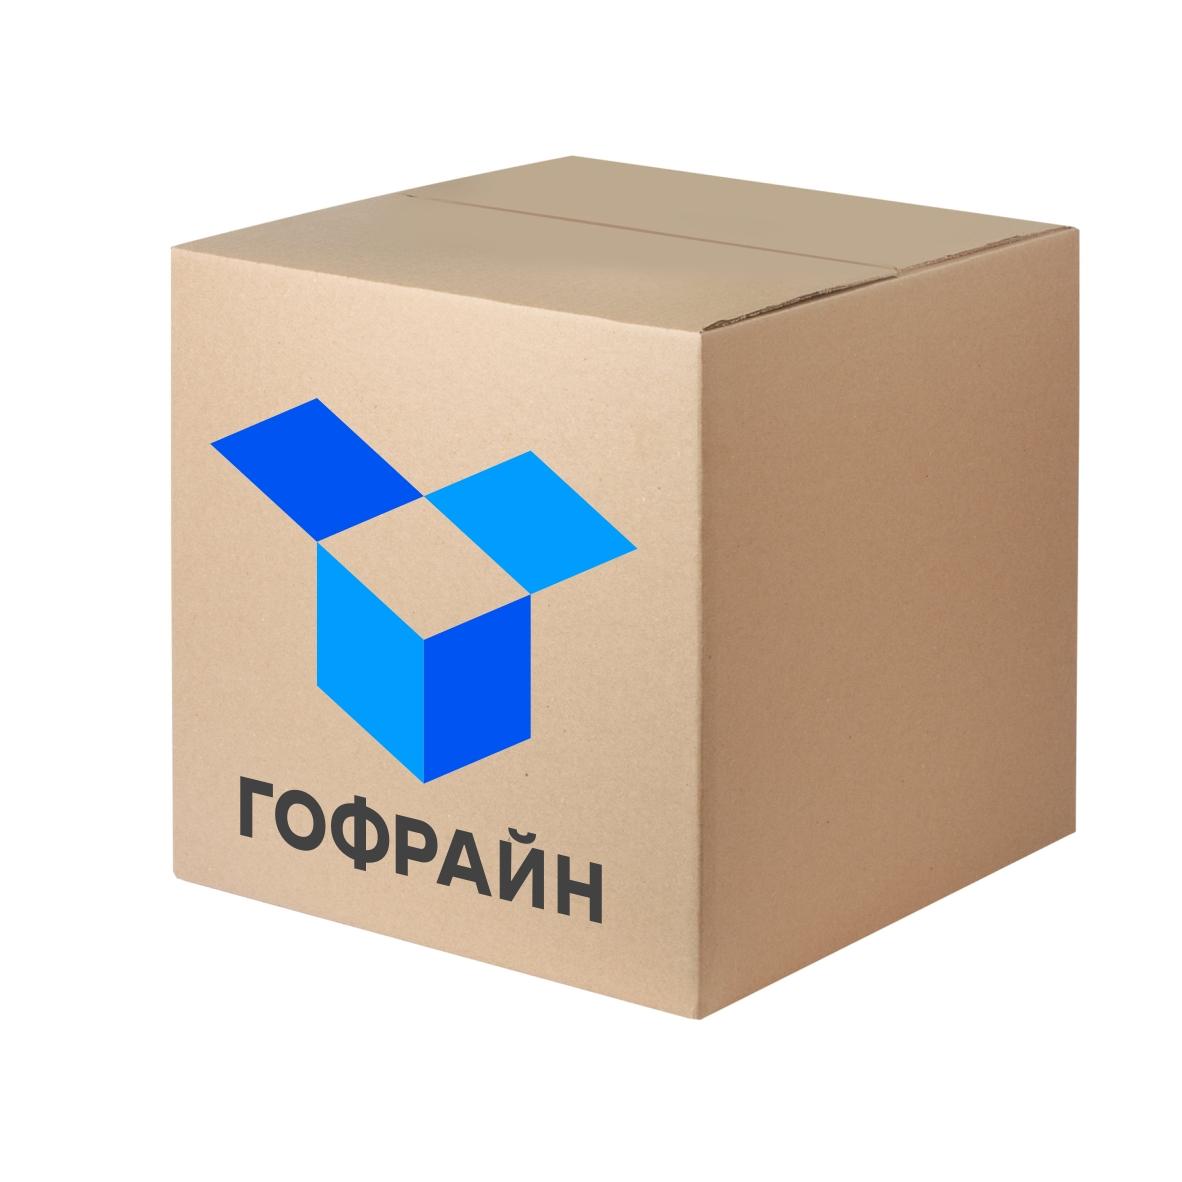 Логотип для компании по реализации упаковки из гофрокартона фото f_2405cdba639bc790.jpg